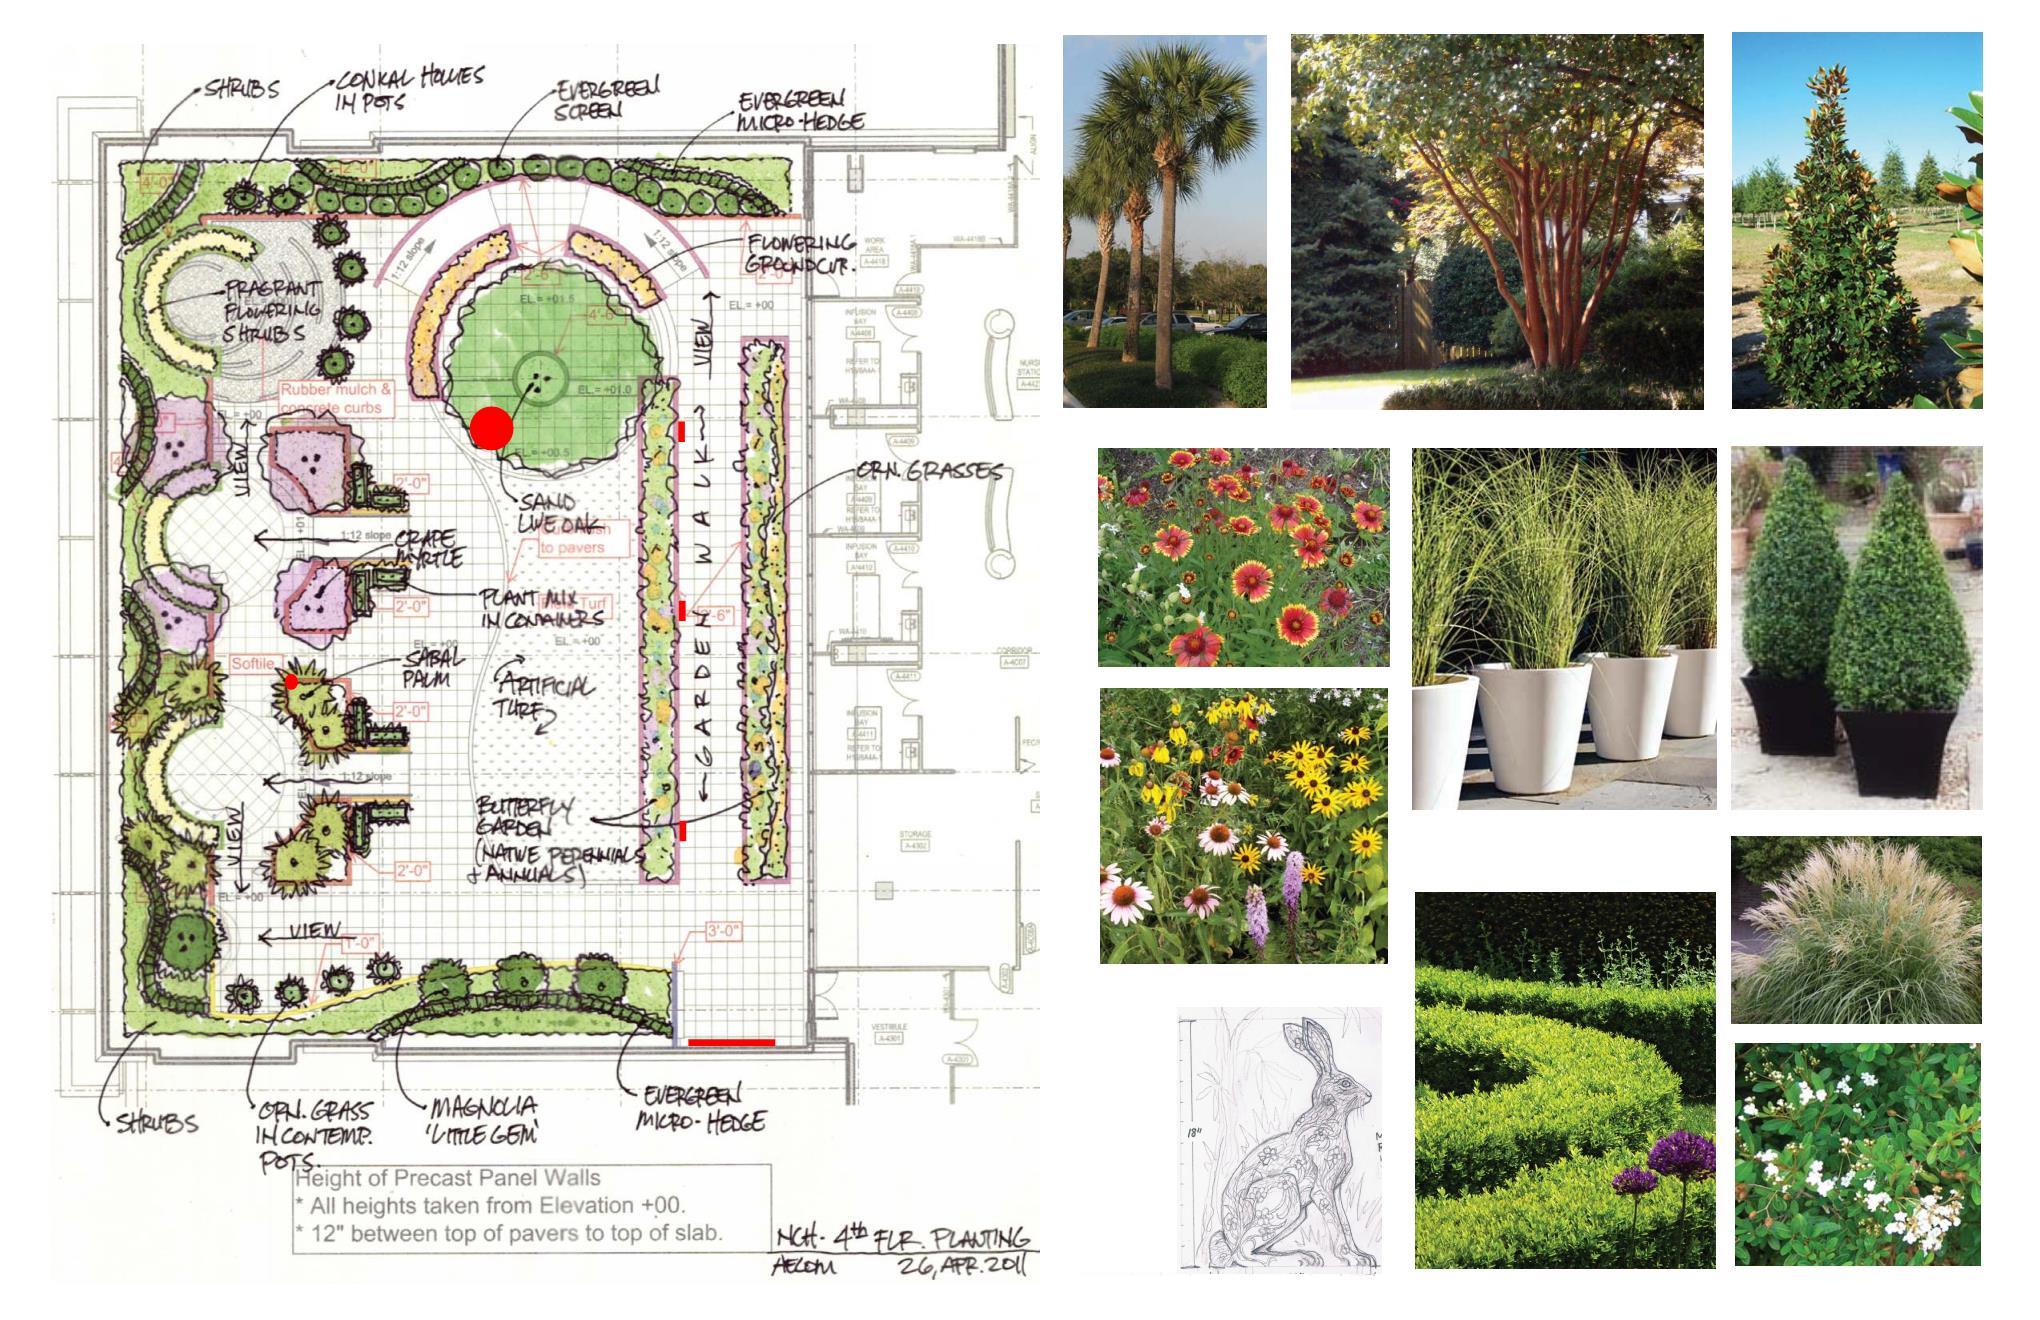 Project: Nemours Children's Hospital - Gardens - CODAworx